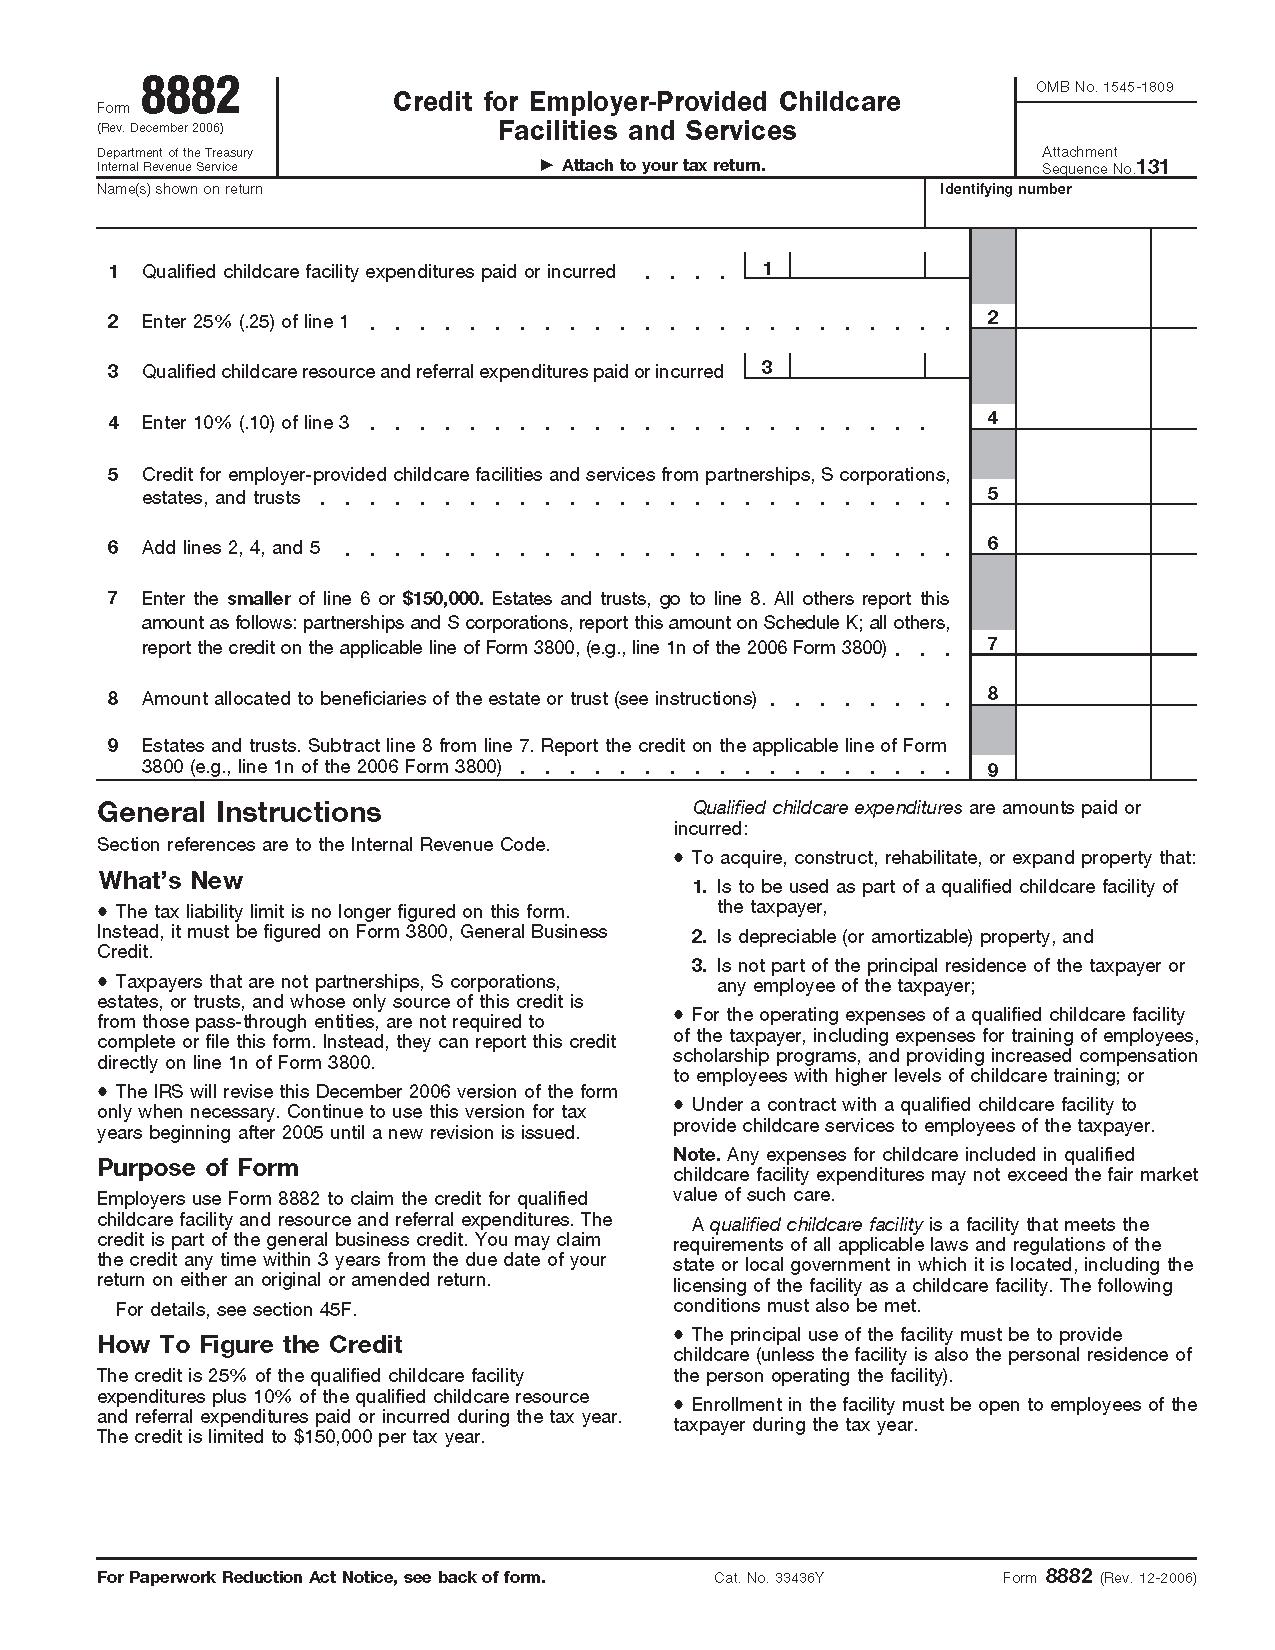 1040ez Form 2011 Printable